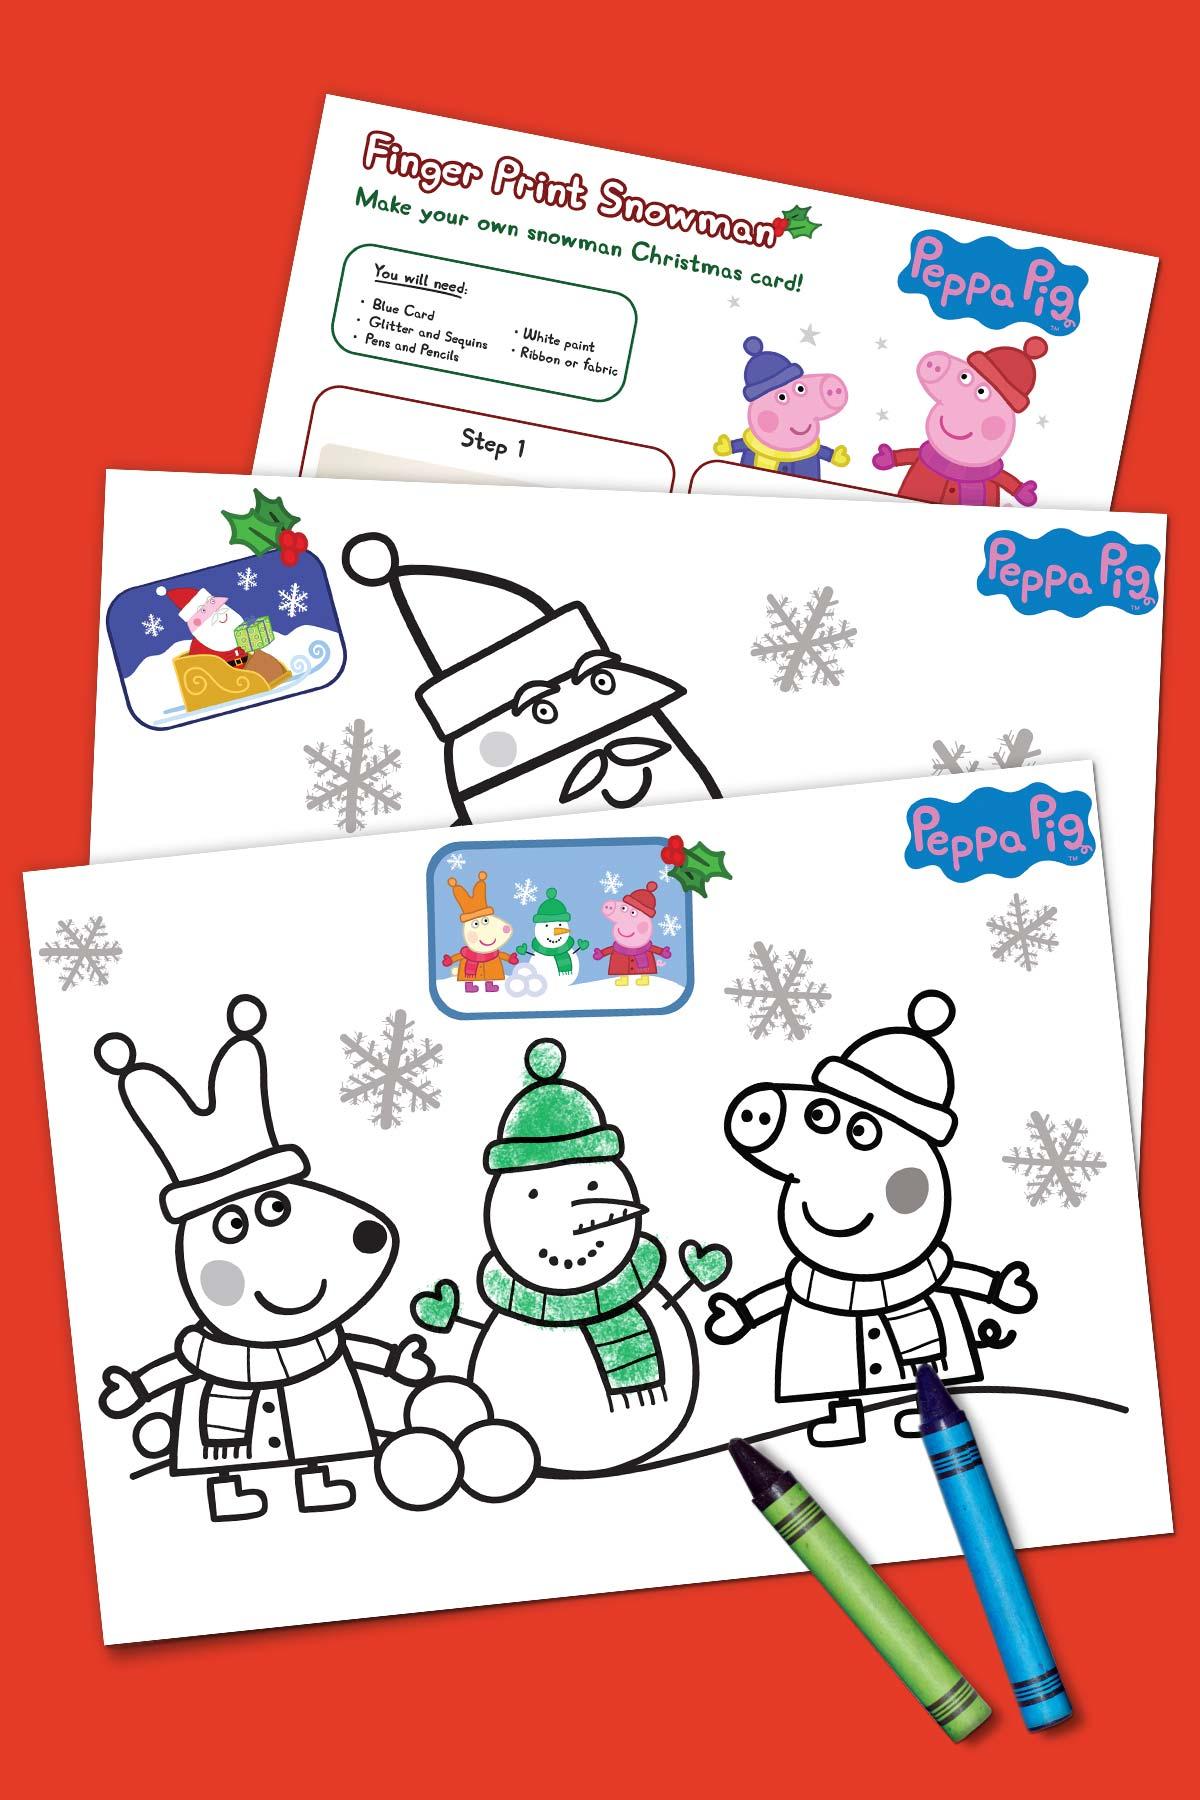 Peppa Pig Holiday Activity Pack